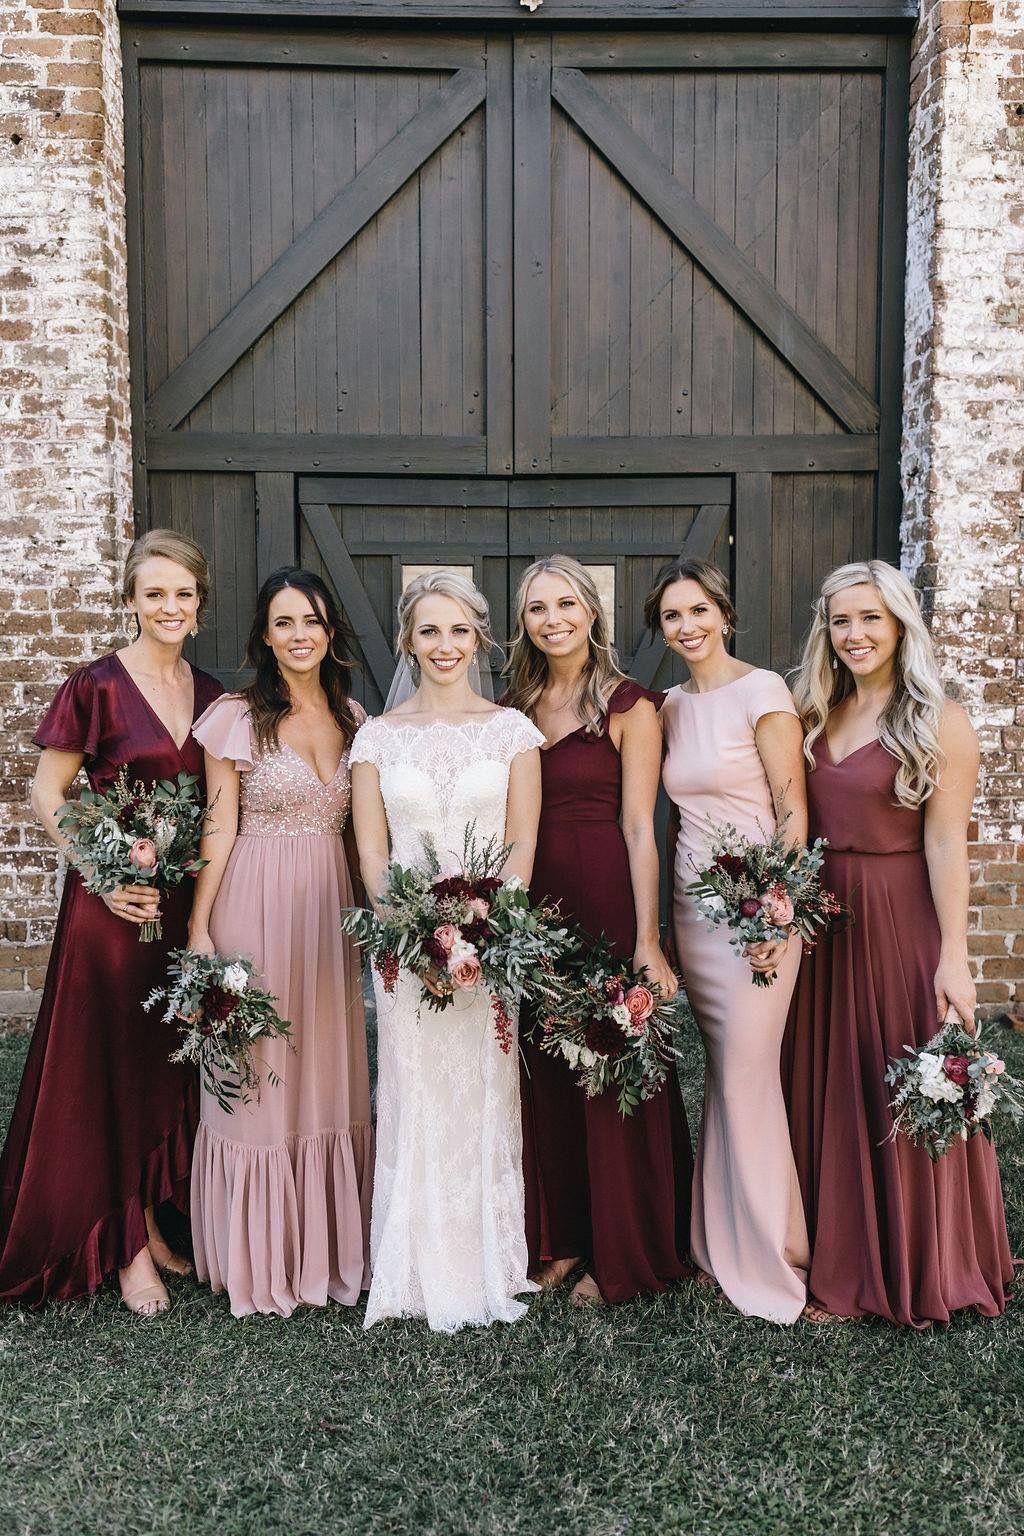 Dustyrosewedding Mixed Bridesmaid Dresses Fall Bridesmaid Dresses Dusty Rose Bridesmaid Dresses